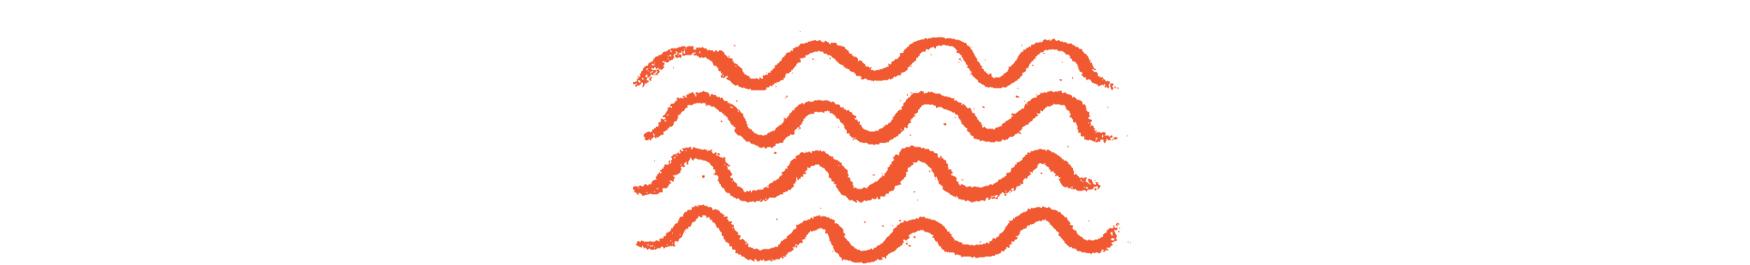 culinary-immersions-orange.jpg